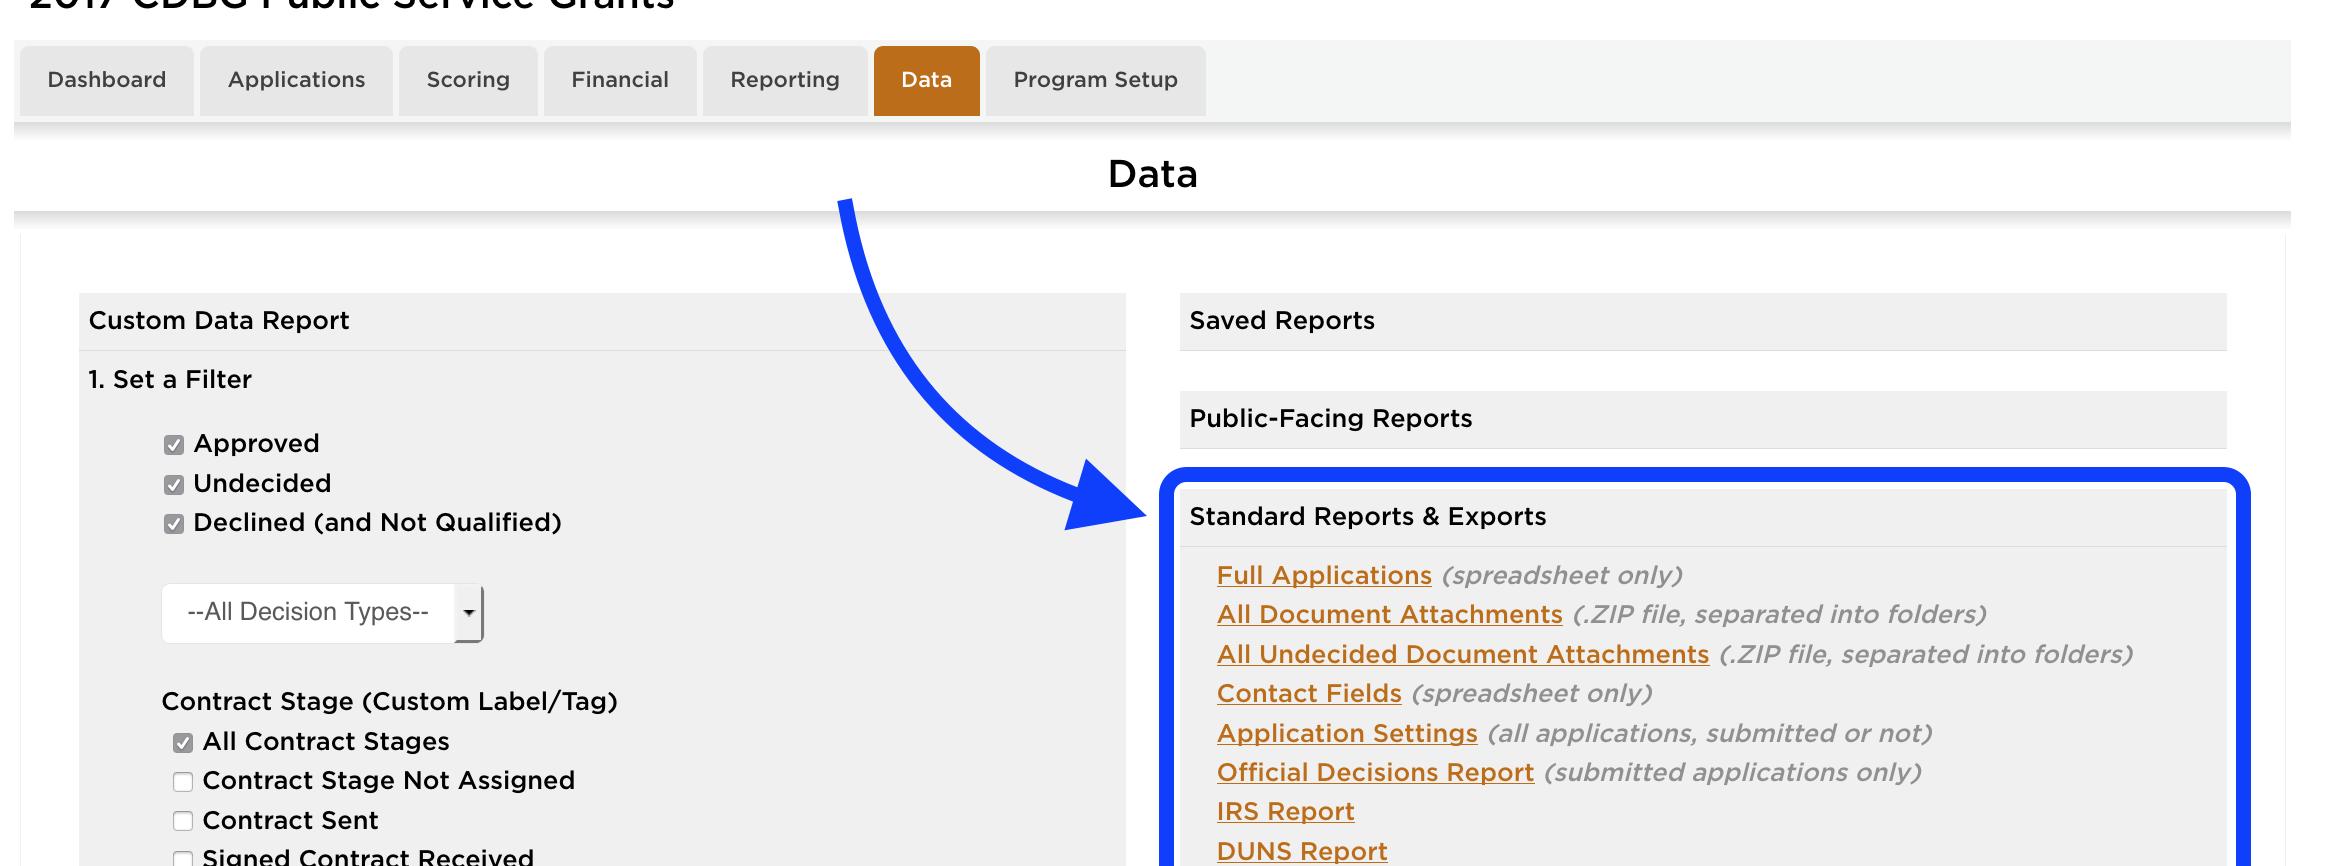 Data Tab: Standard Reports & Exports